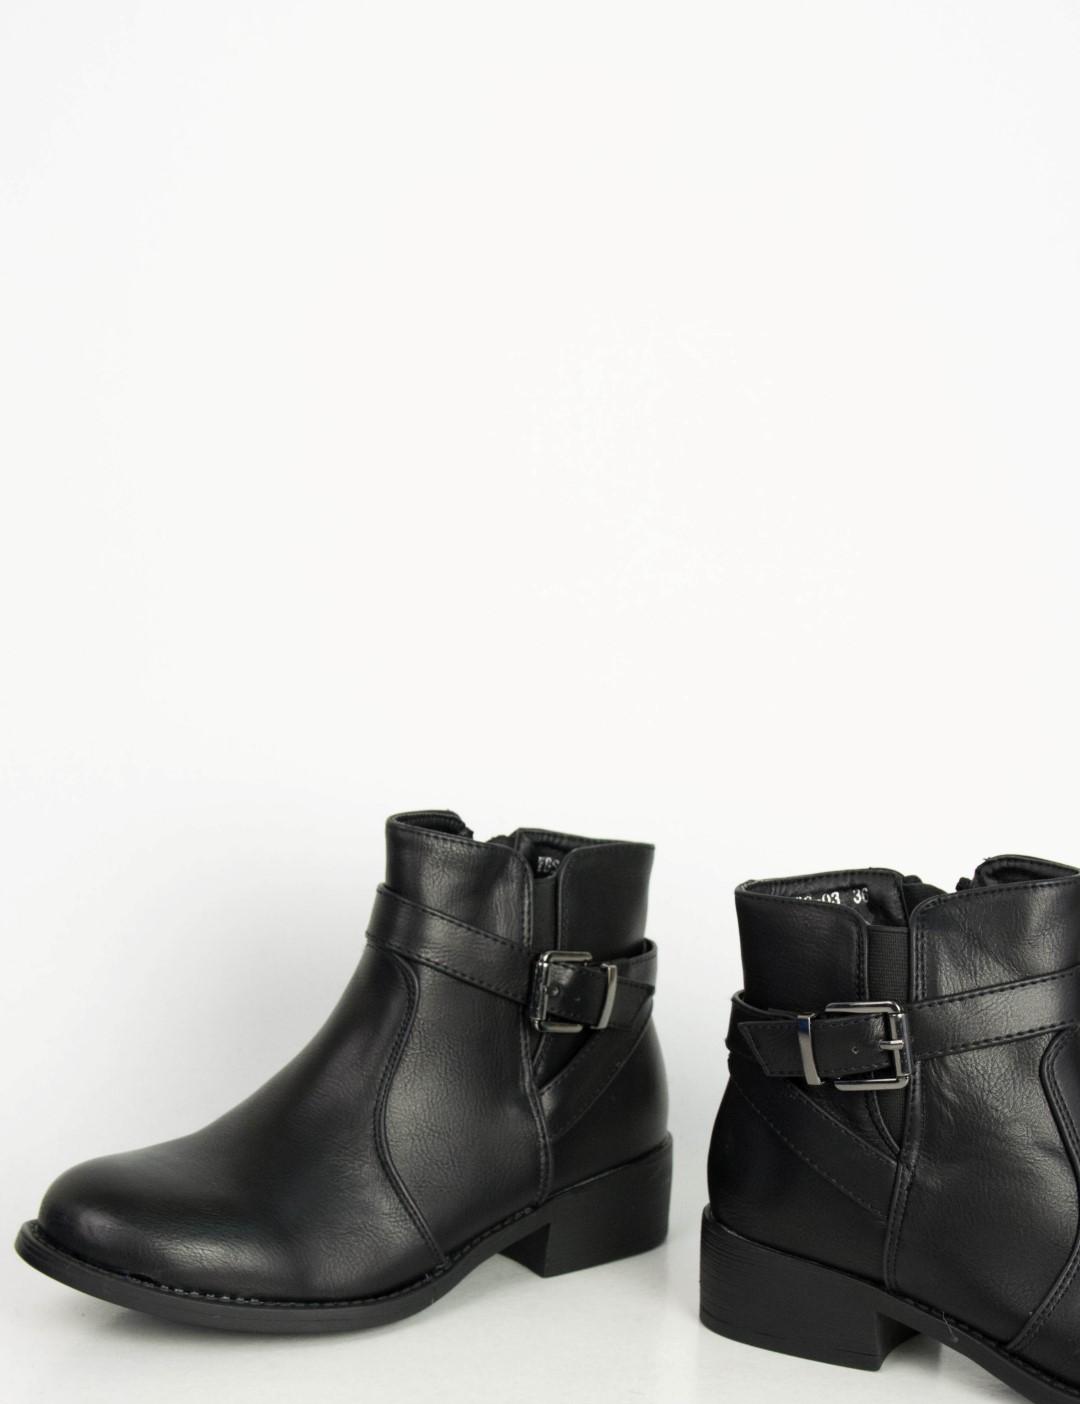 2f2209d7fef Γυναικεία Παπούτσια, Γυναικεία Μποτάκια, Μποτάκια Χωρίς Τακούνι